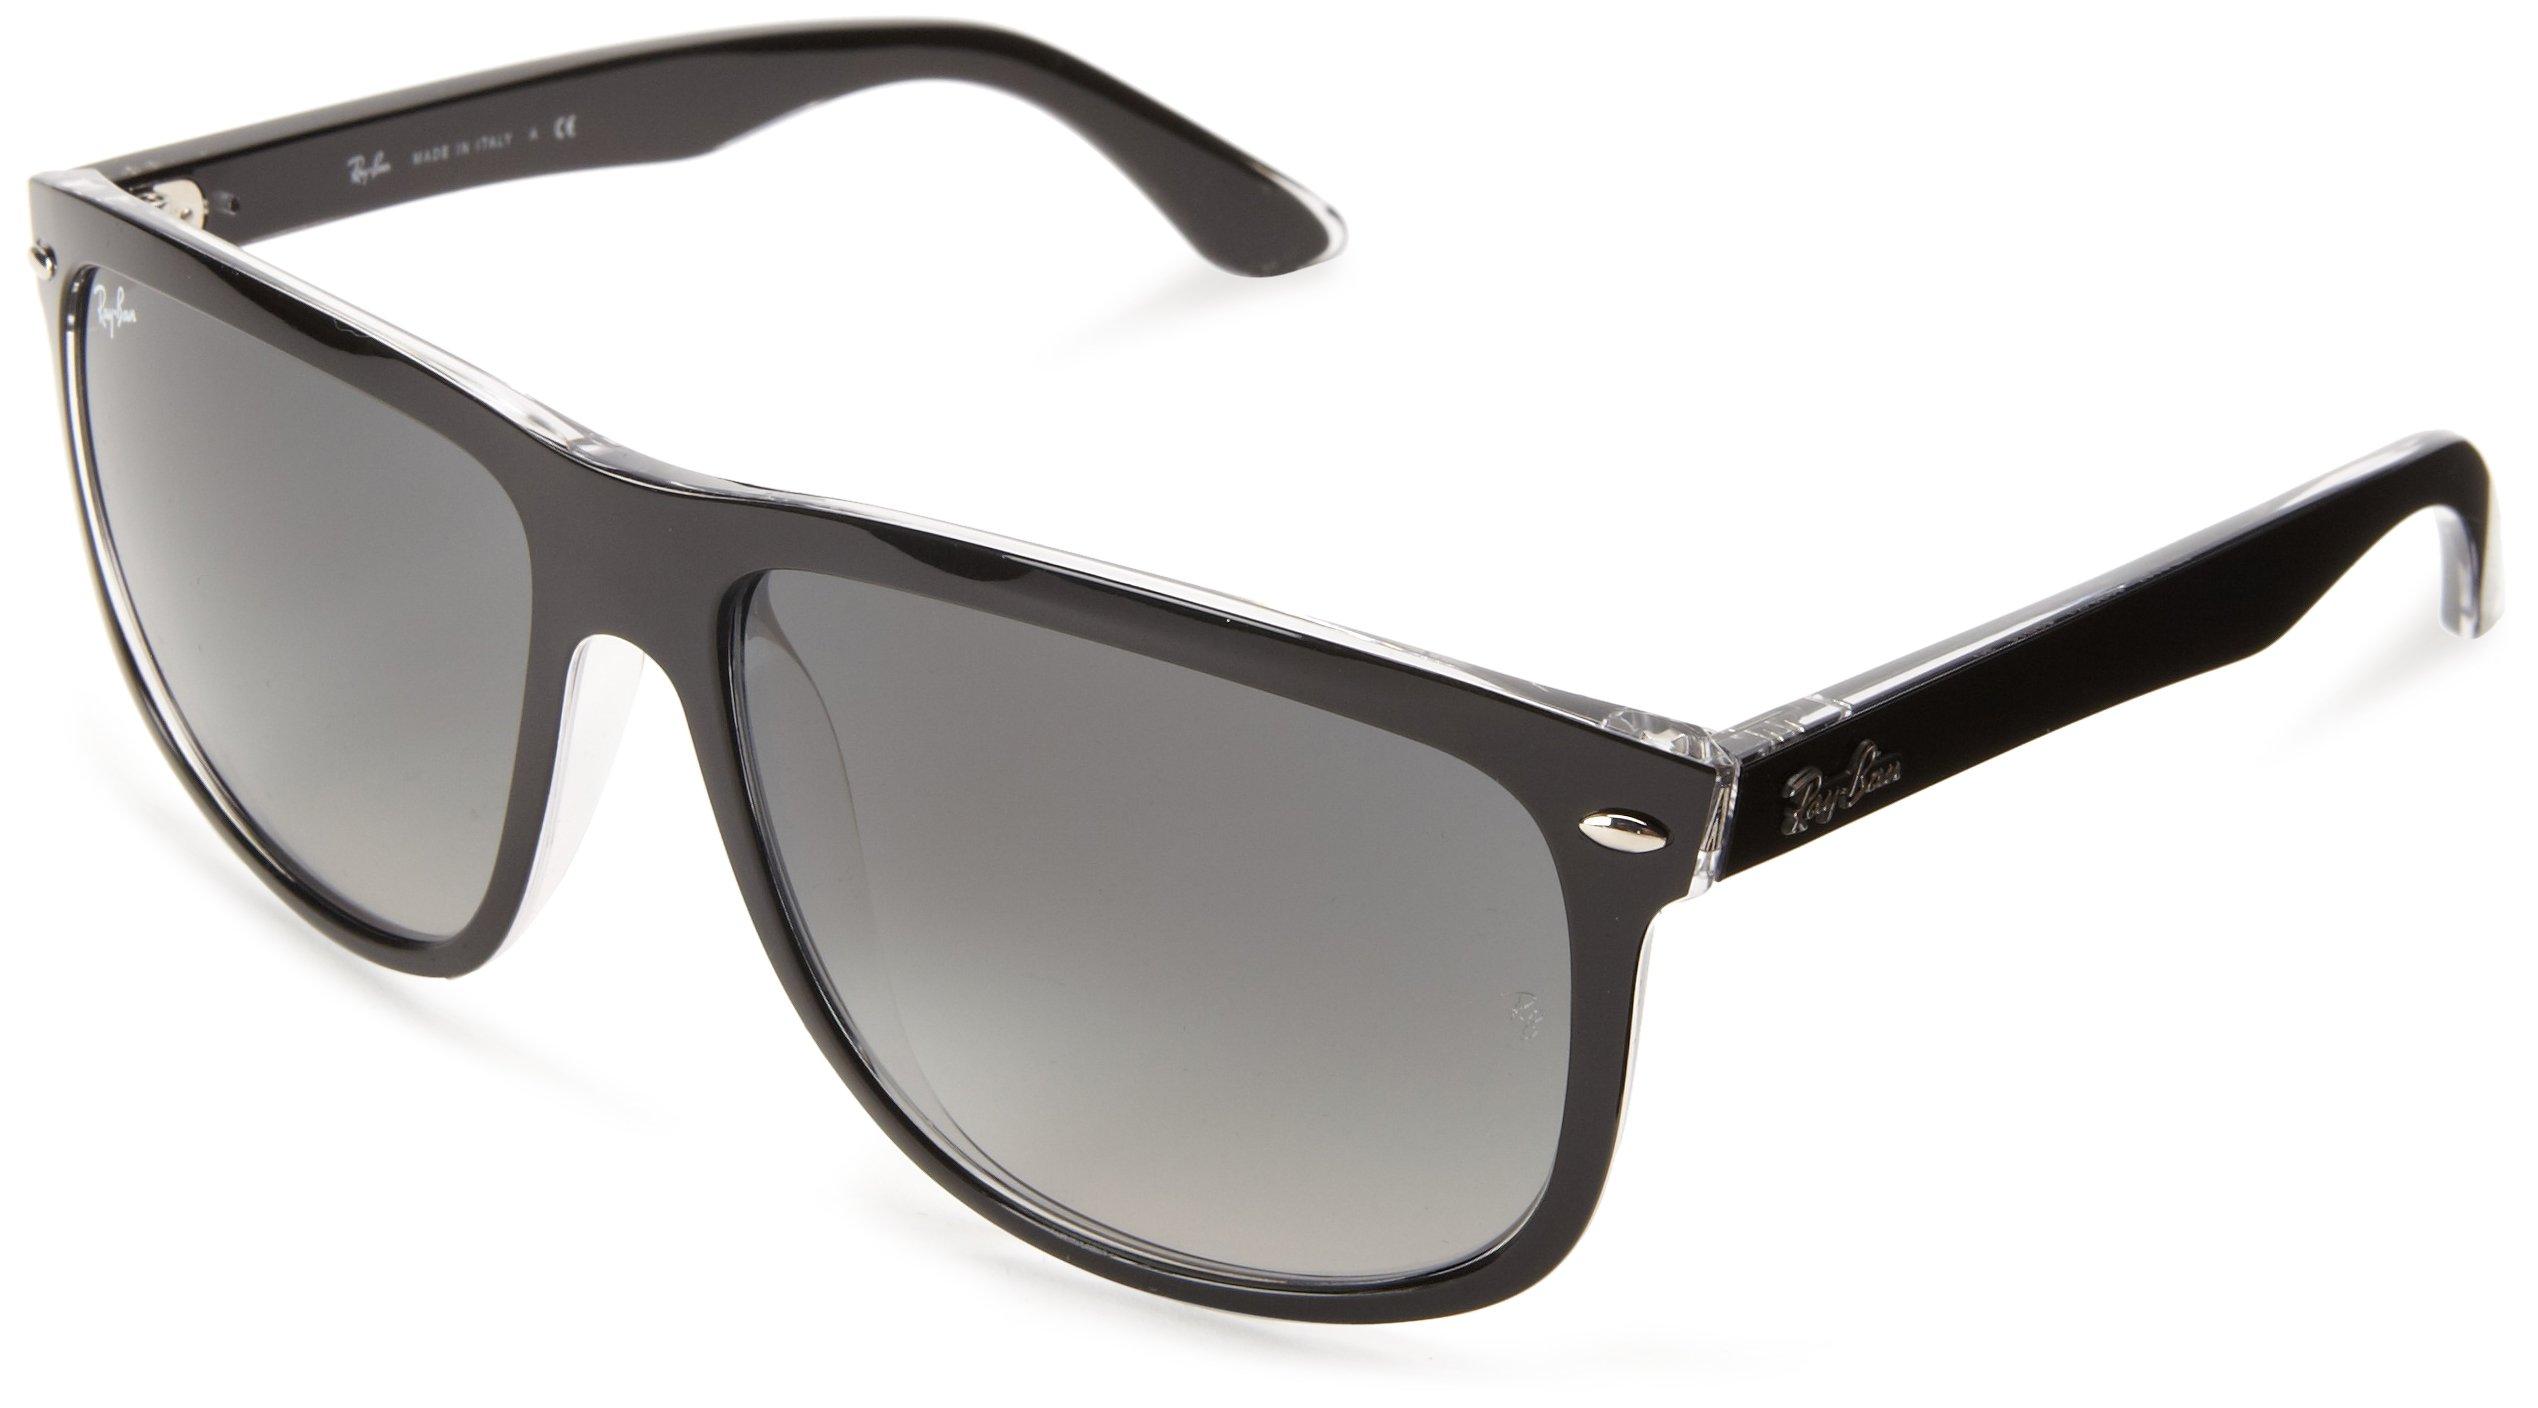 Ray-Ban RB4147 Boyfriend Square Sunglasses, Black On Transparent/Grey Gradient, 60 mm